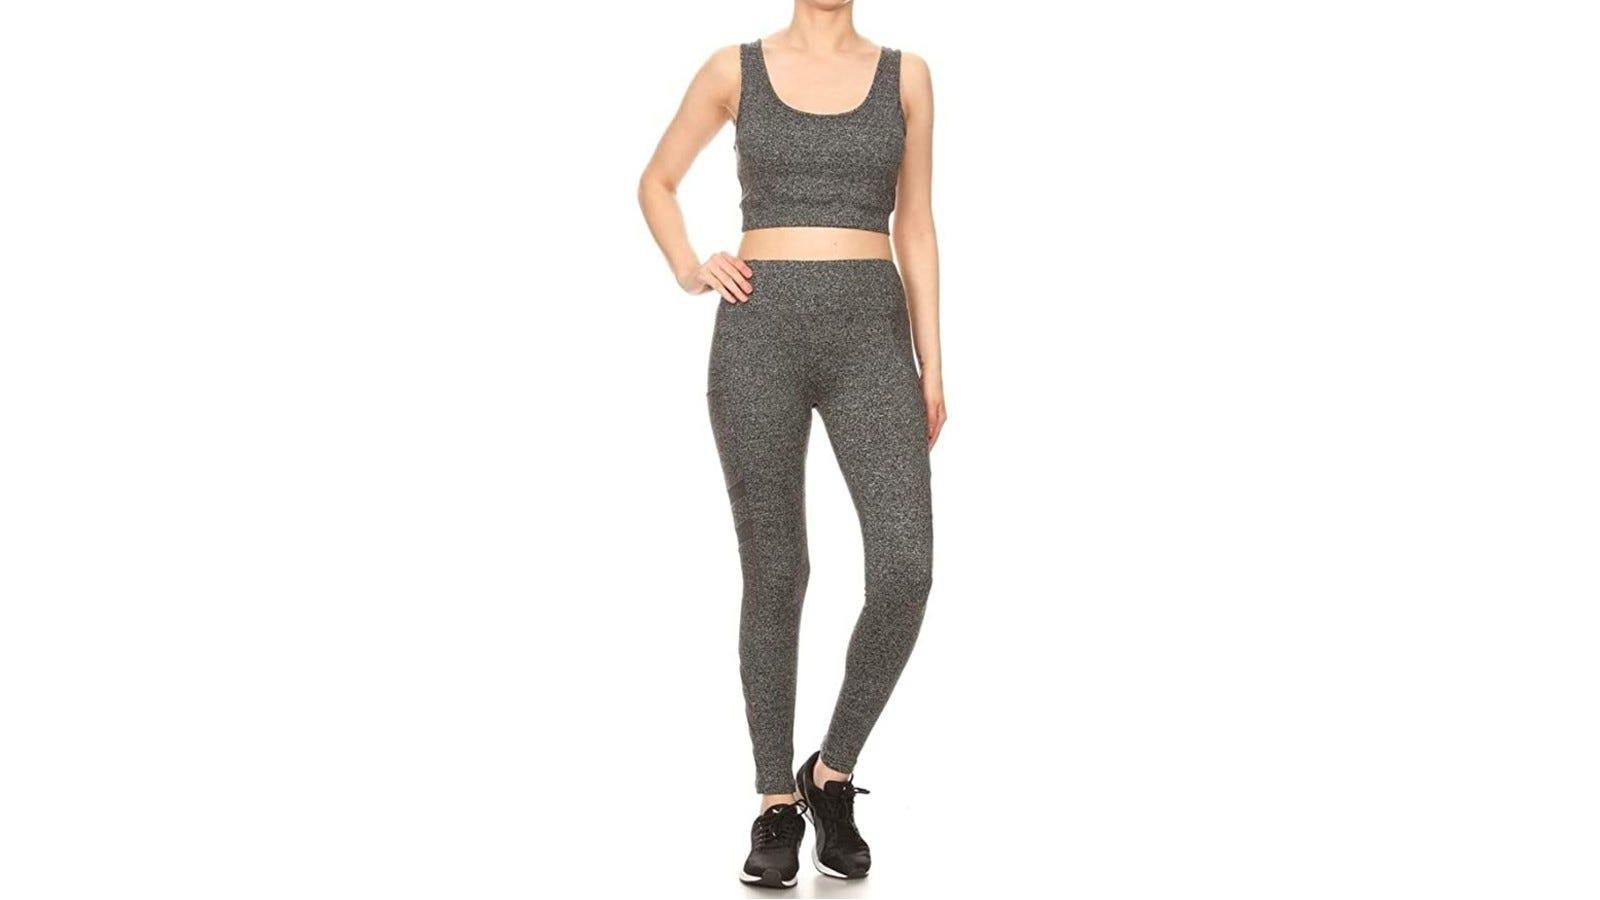 woman wearing gray activewear set